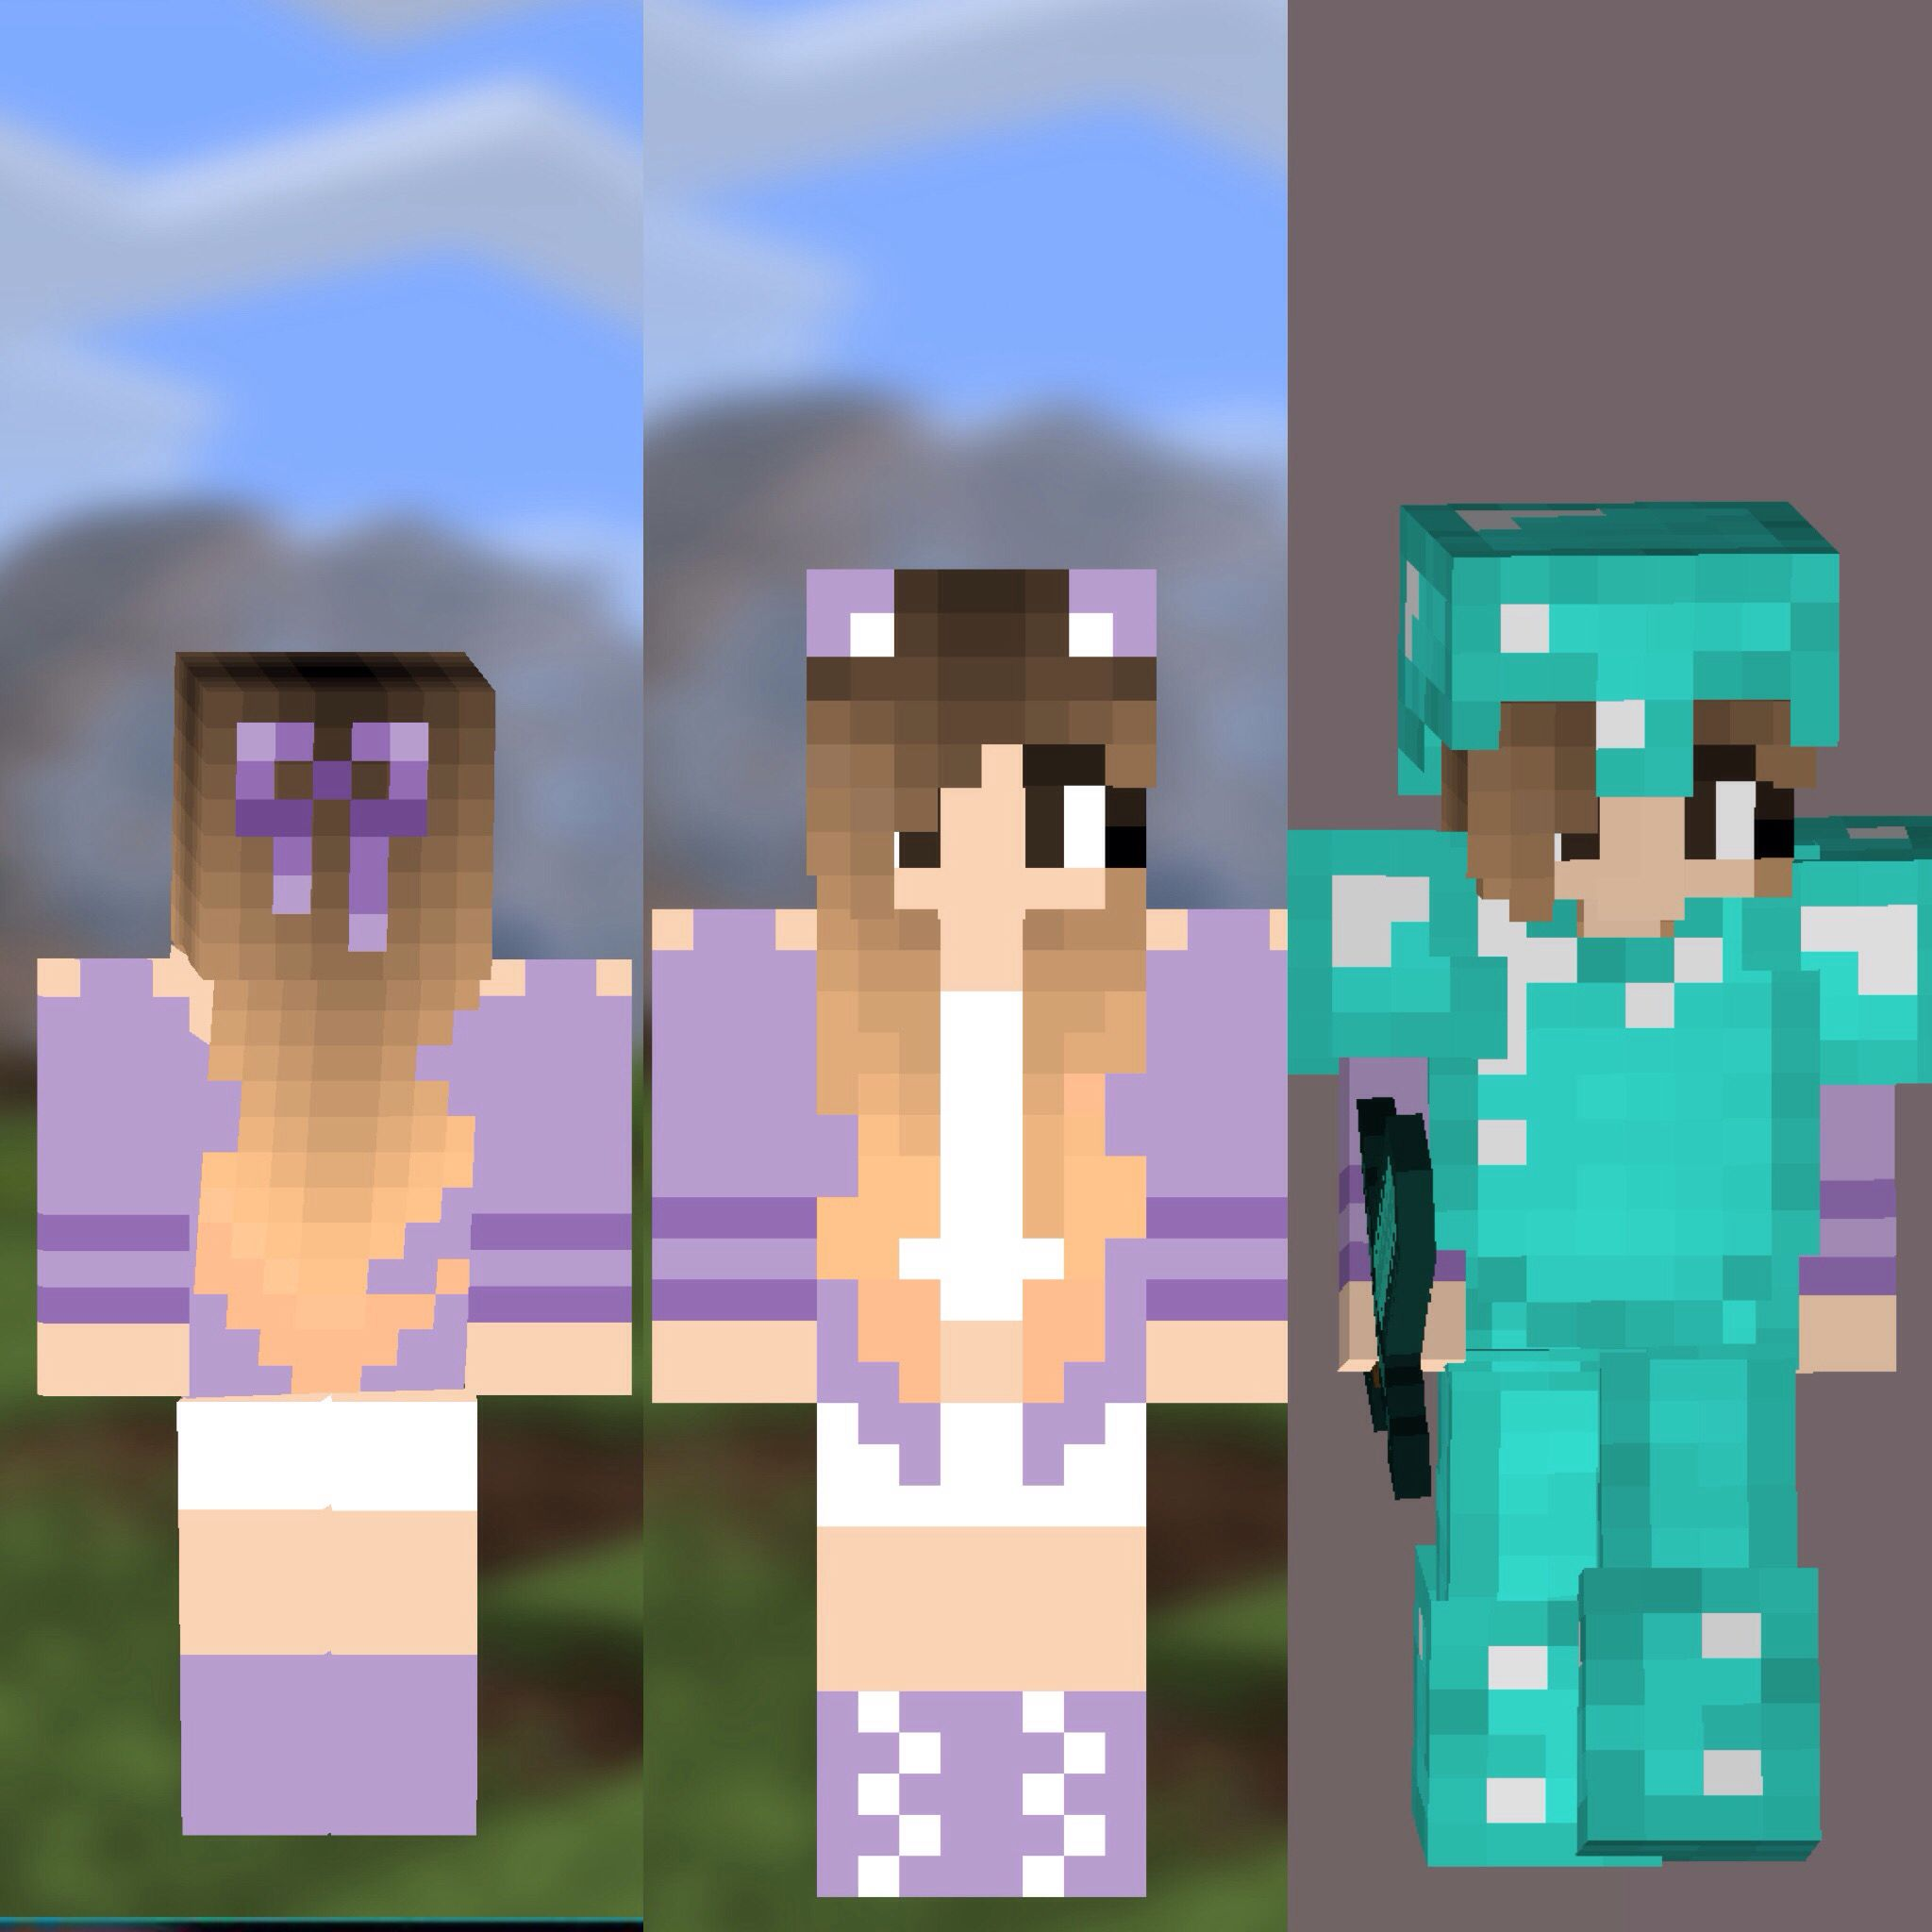 My Minecraft Skin in Minecraft PE. My Minecraft PE